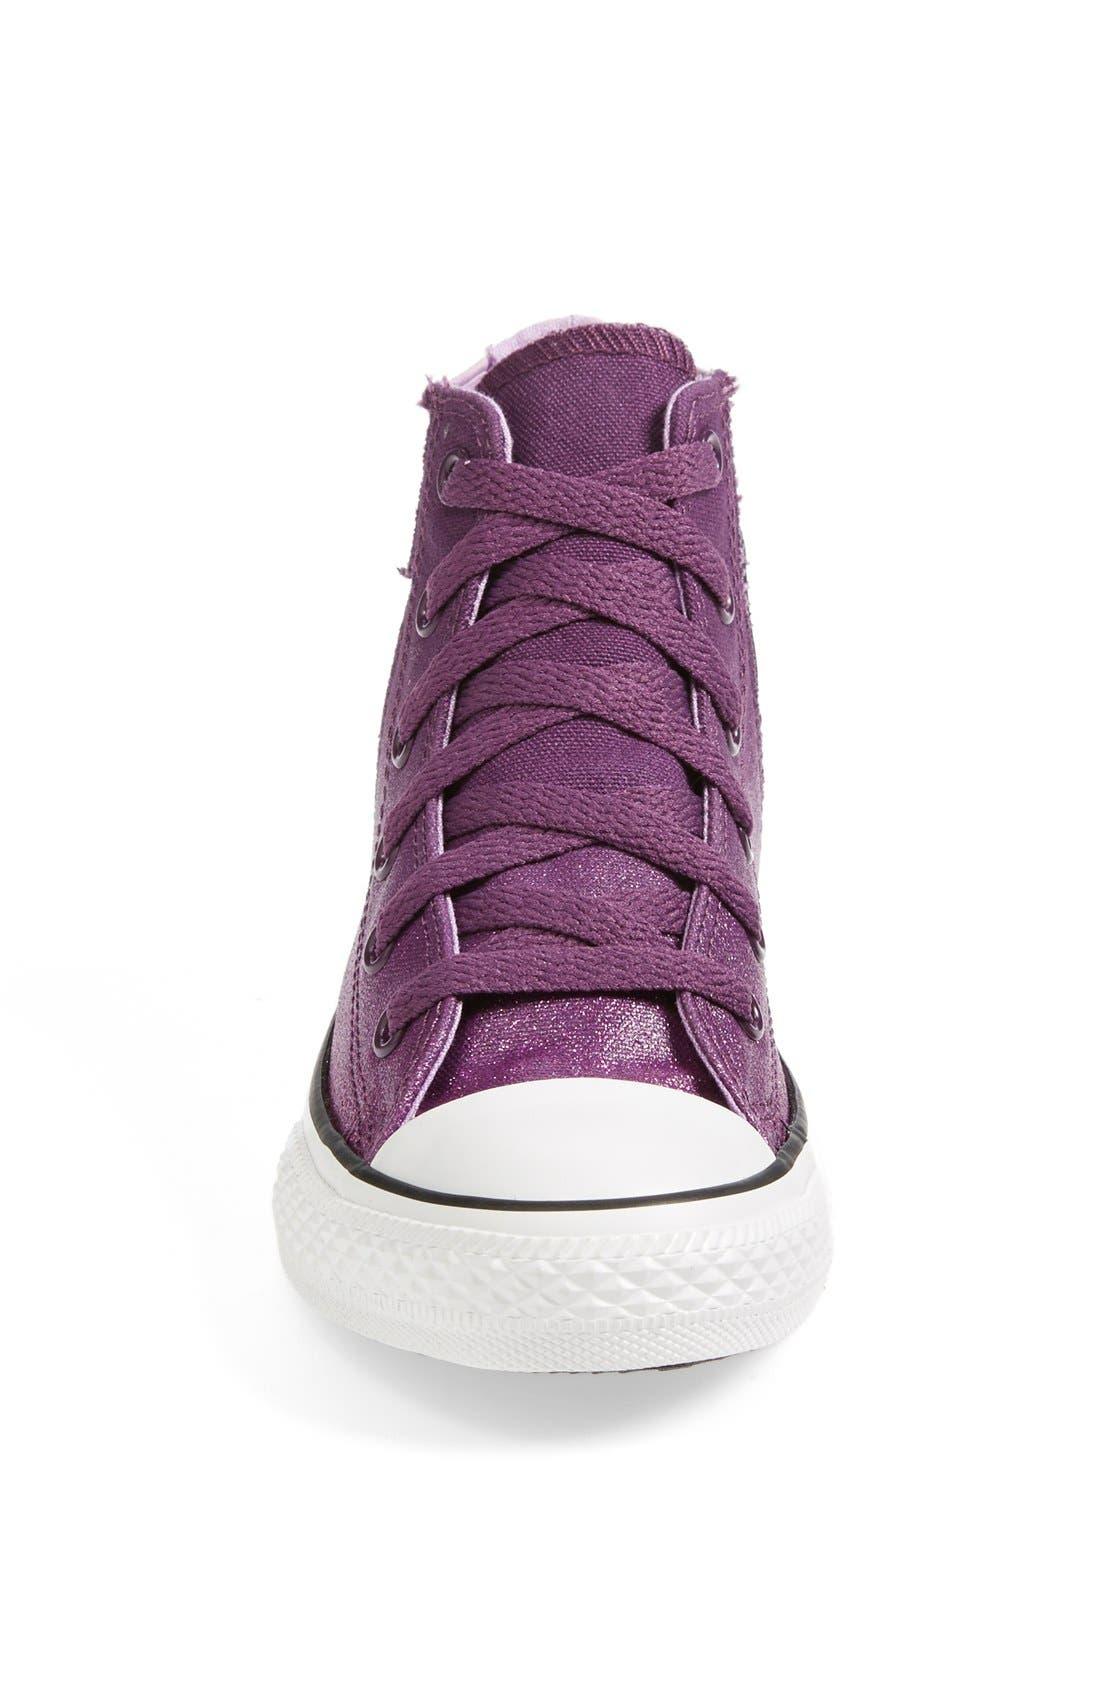 Alternate Image 3  - Converse Chuck Taylor® All Star® 'Sparkle Wash Boltz' High Top Sneaker (Toddler, Little Kid & Big Kid)